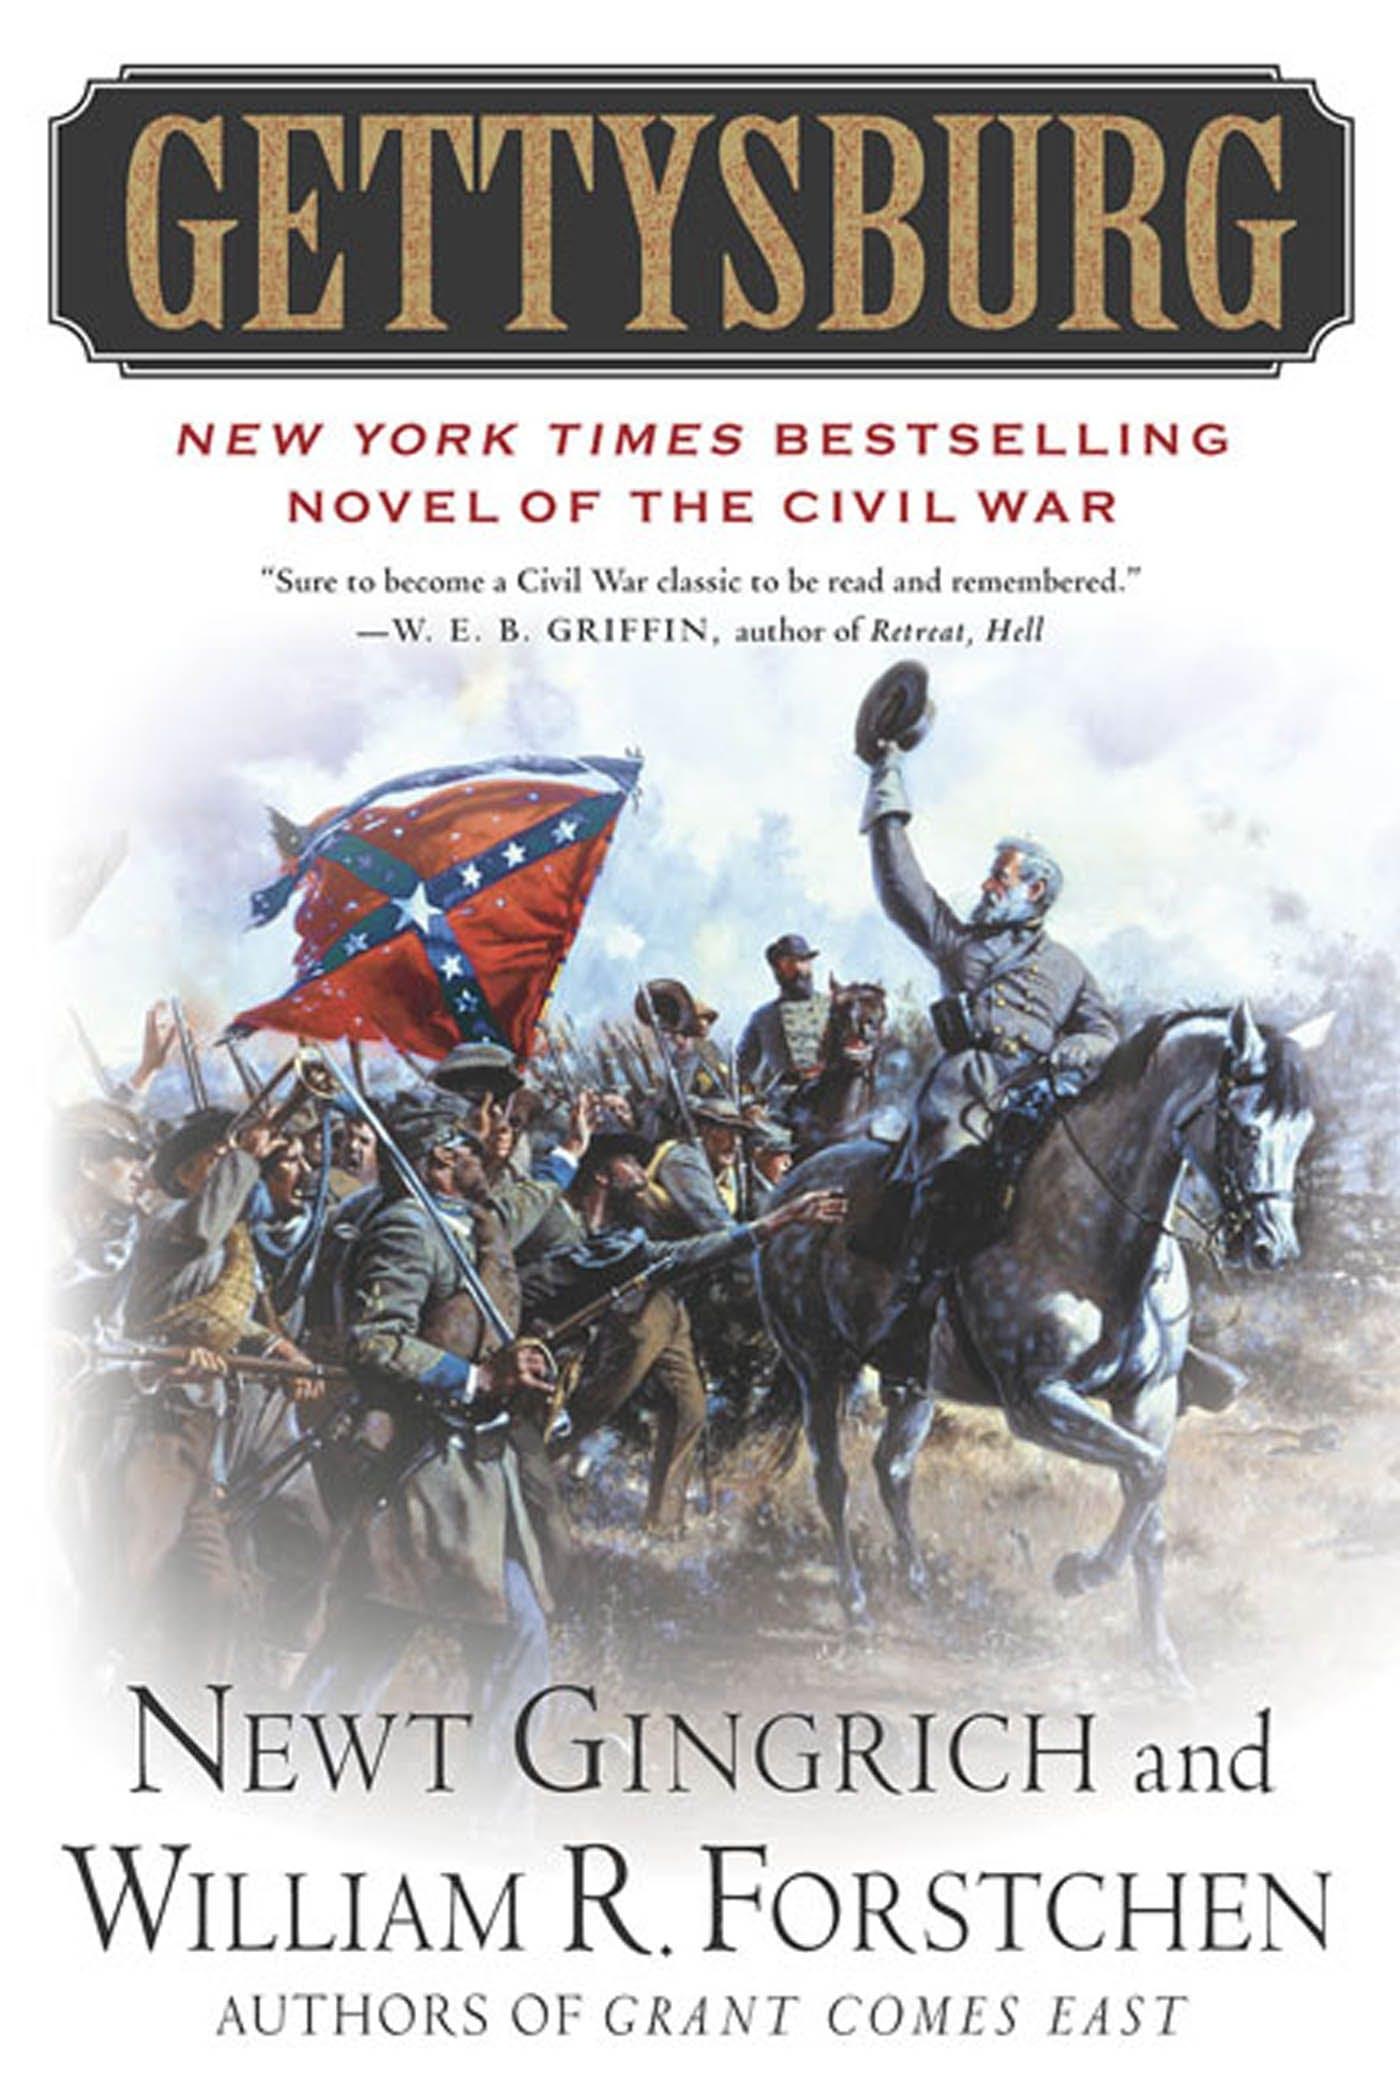 Image of Gettysburg